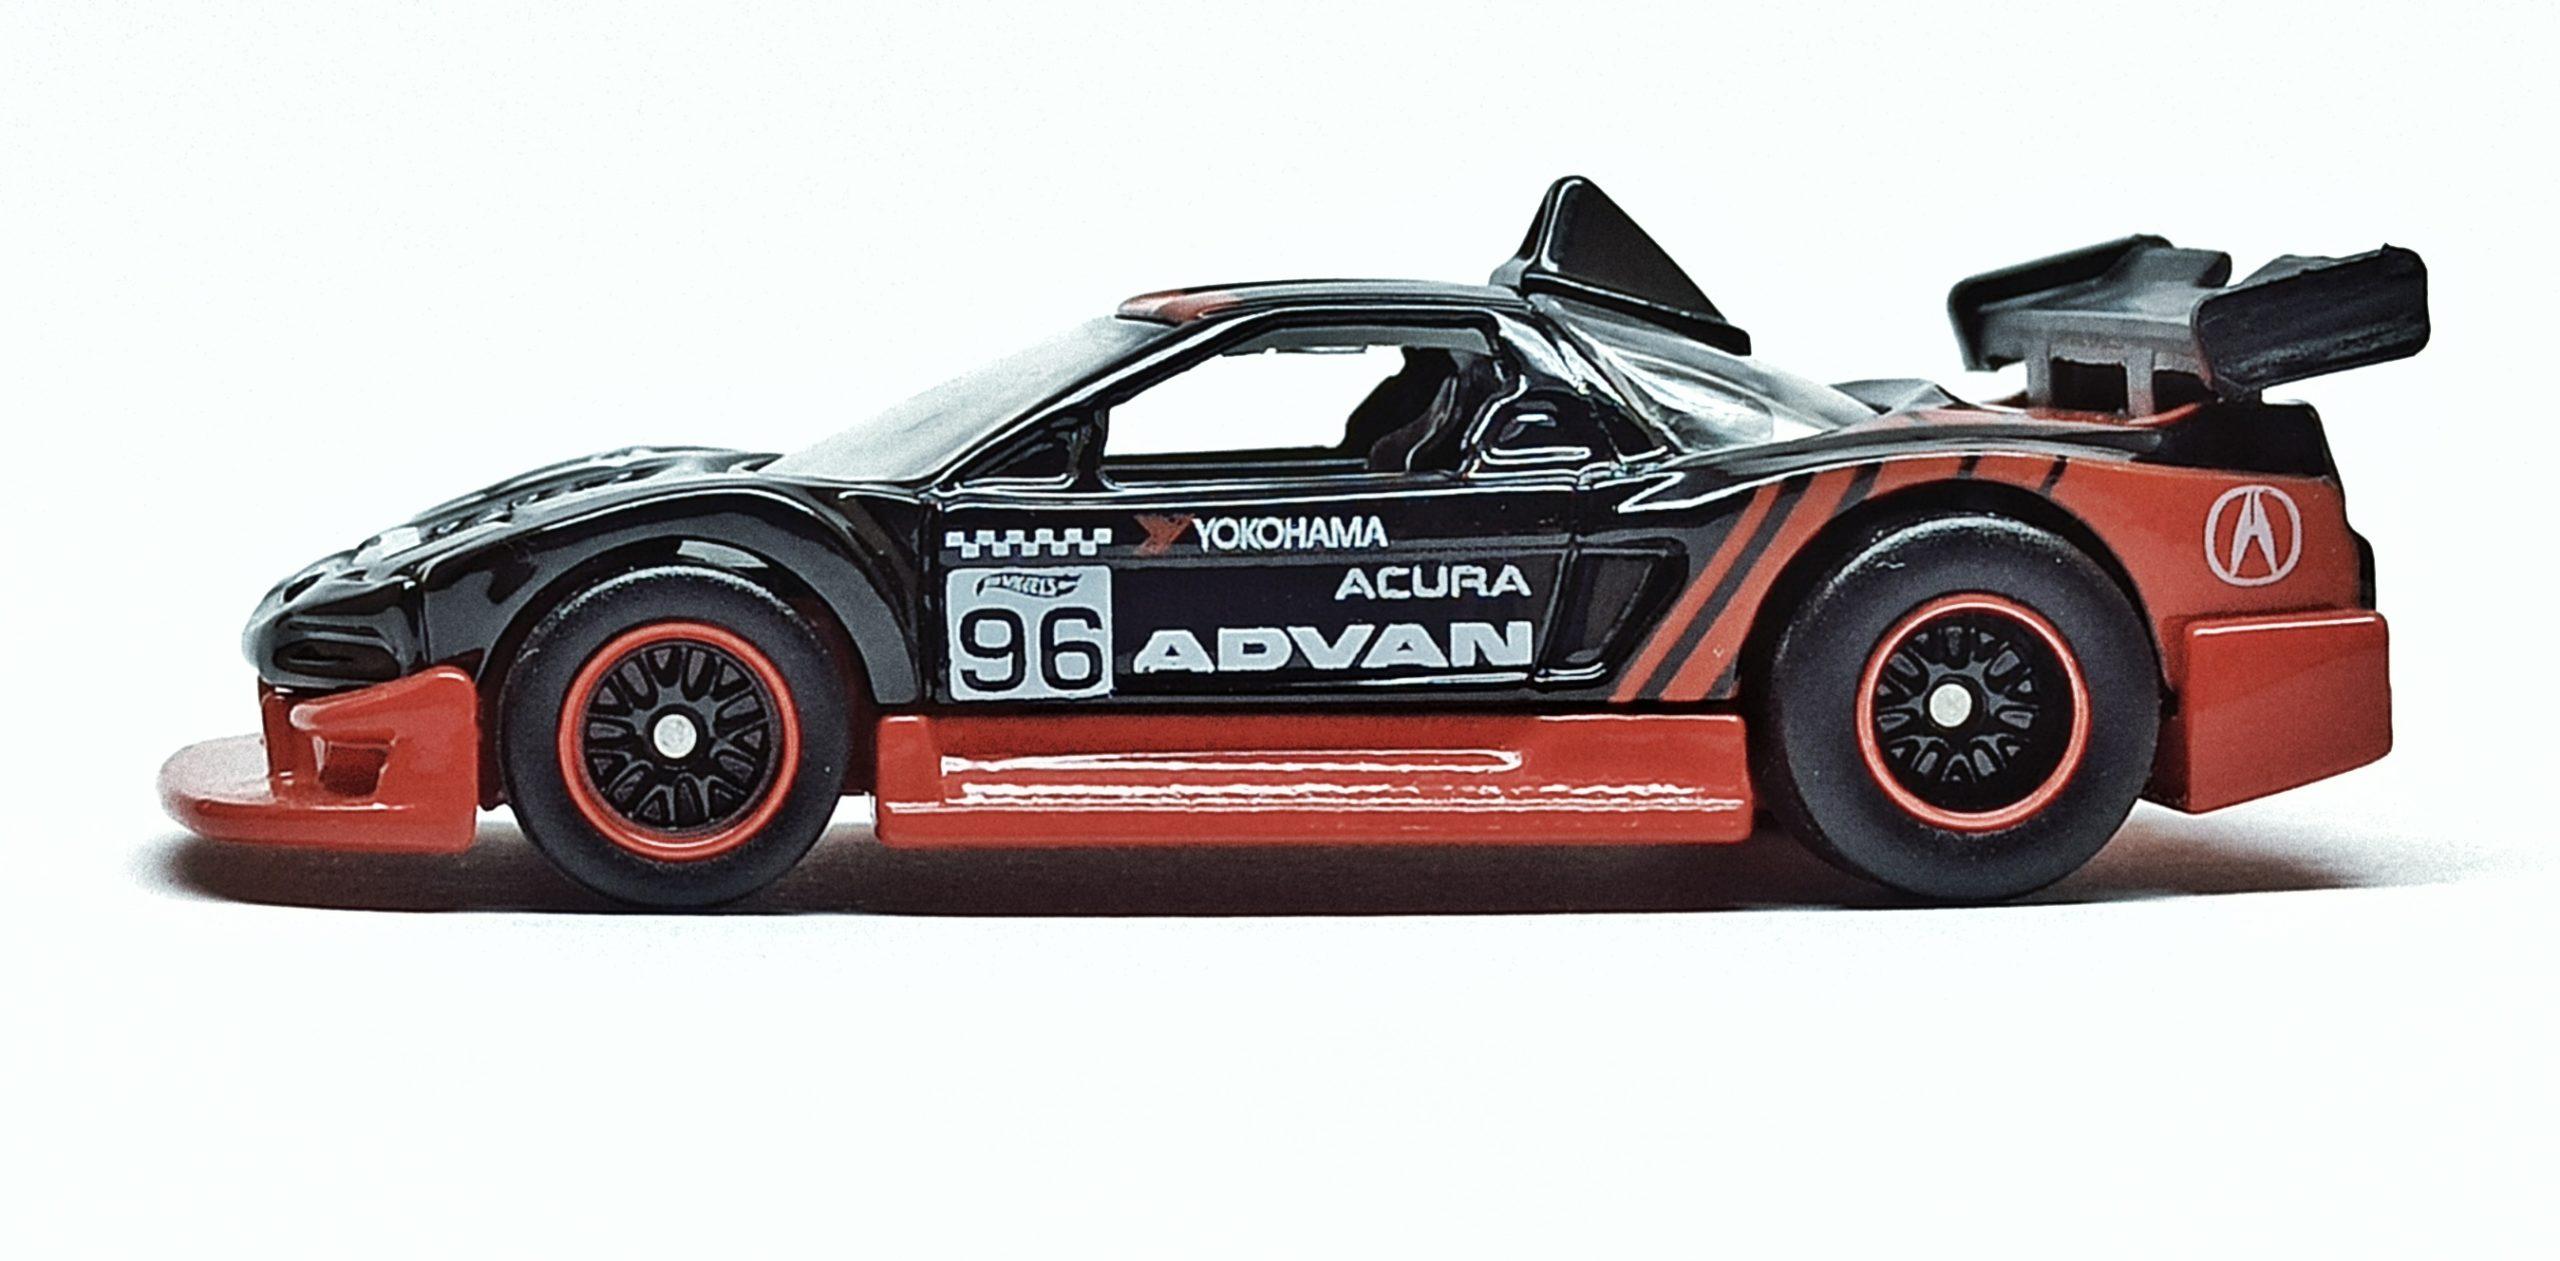 Hot Wheels Acura NSX (DWH79) 2017 Car Culture: Race Day (5/5) black (Advan)